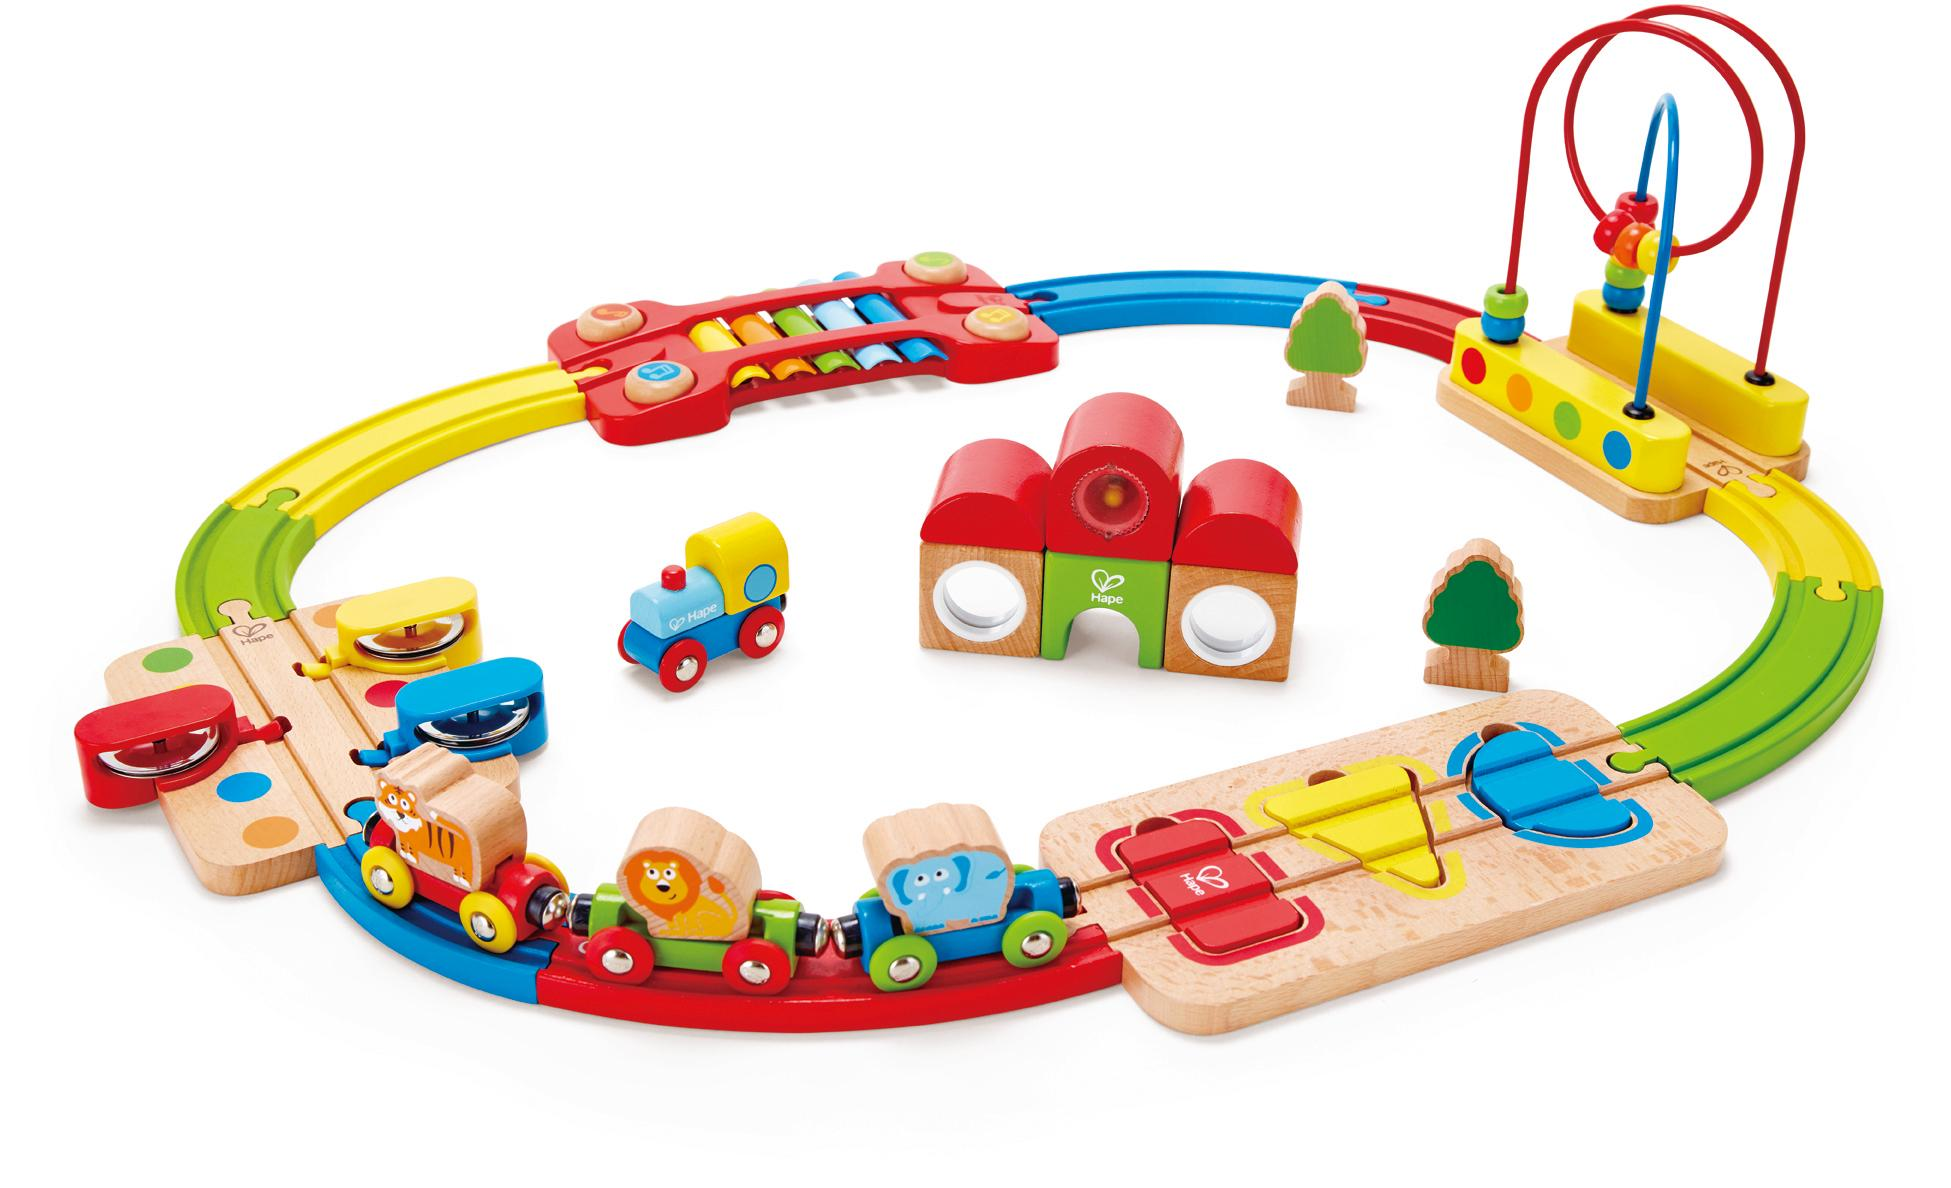 "Hape Spielzeug-Eisenbahn ""Regenbogen-Puzzle Eisenbahnset"" (Set) Technik & Freizeit/Spielzeug/Autos, Eisenbahn & Modellbau/Kindereisenbahnen"